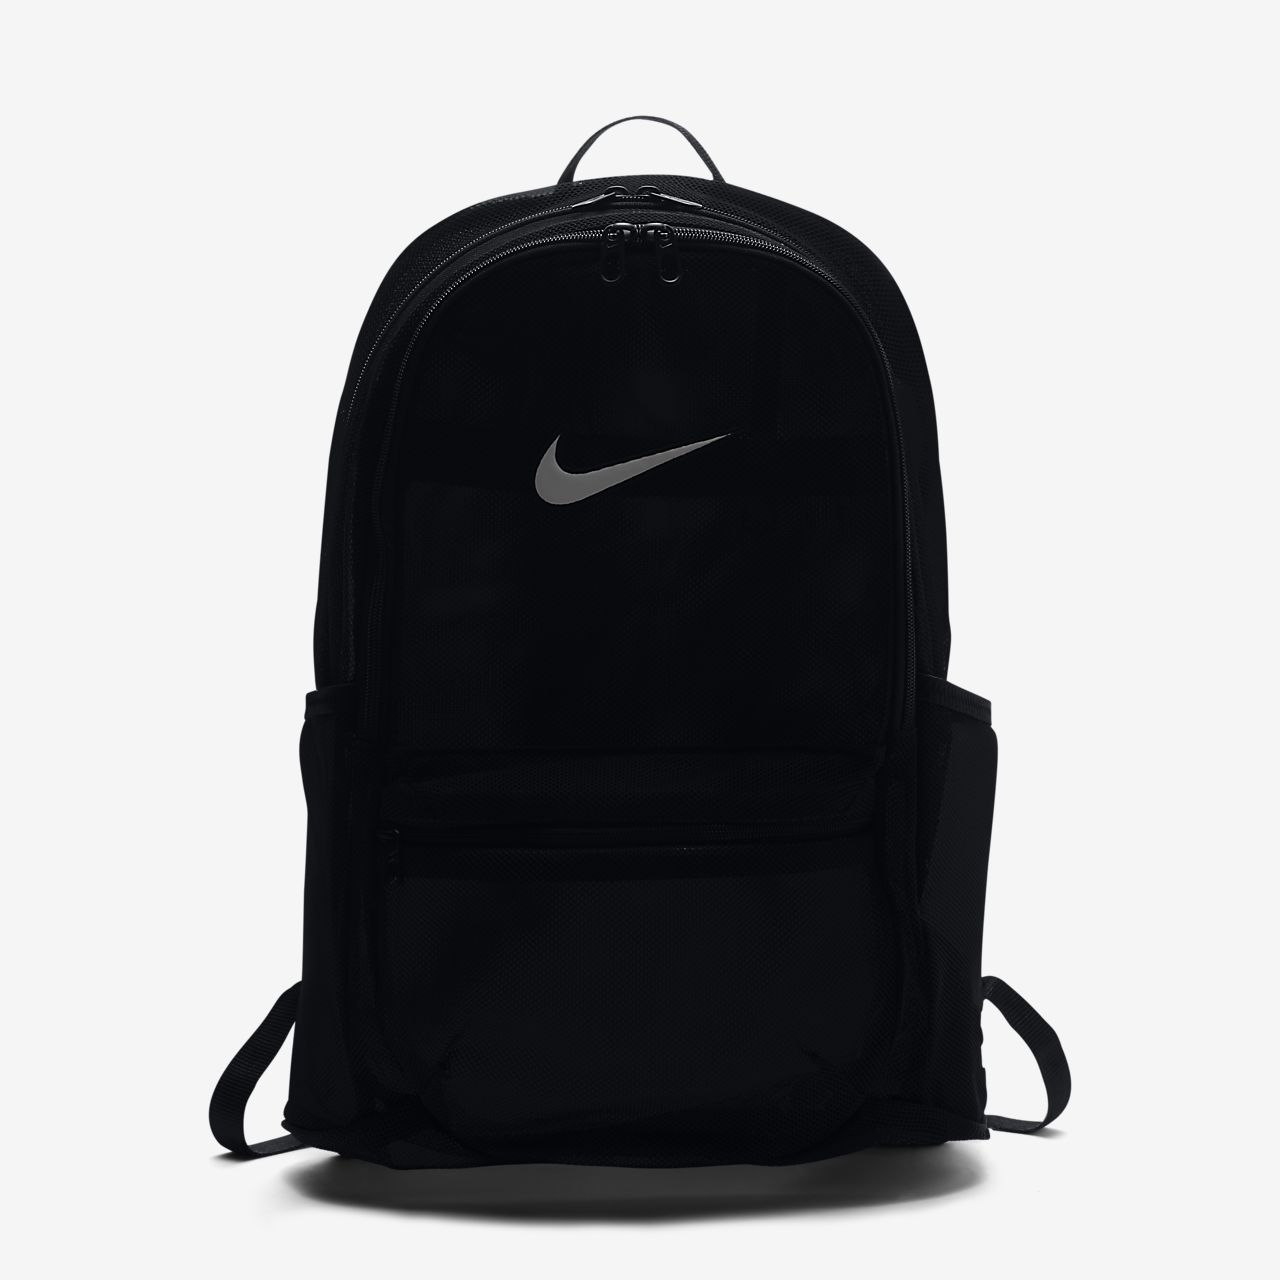 e63a1f93ce8155 Low Resolution Nike Brasilia Mesh Training Backpack Nike Brasilia Mesh  Training Backpack